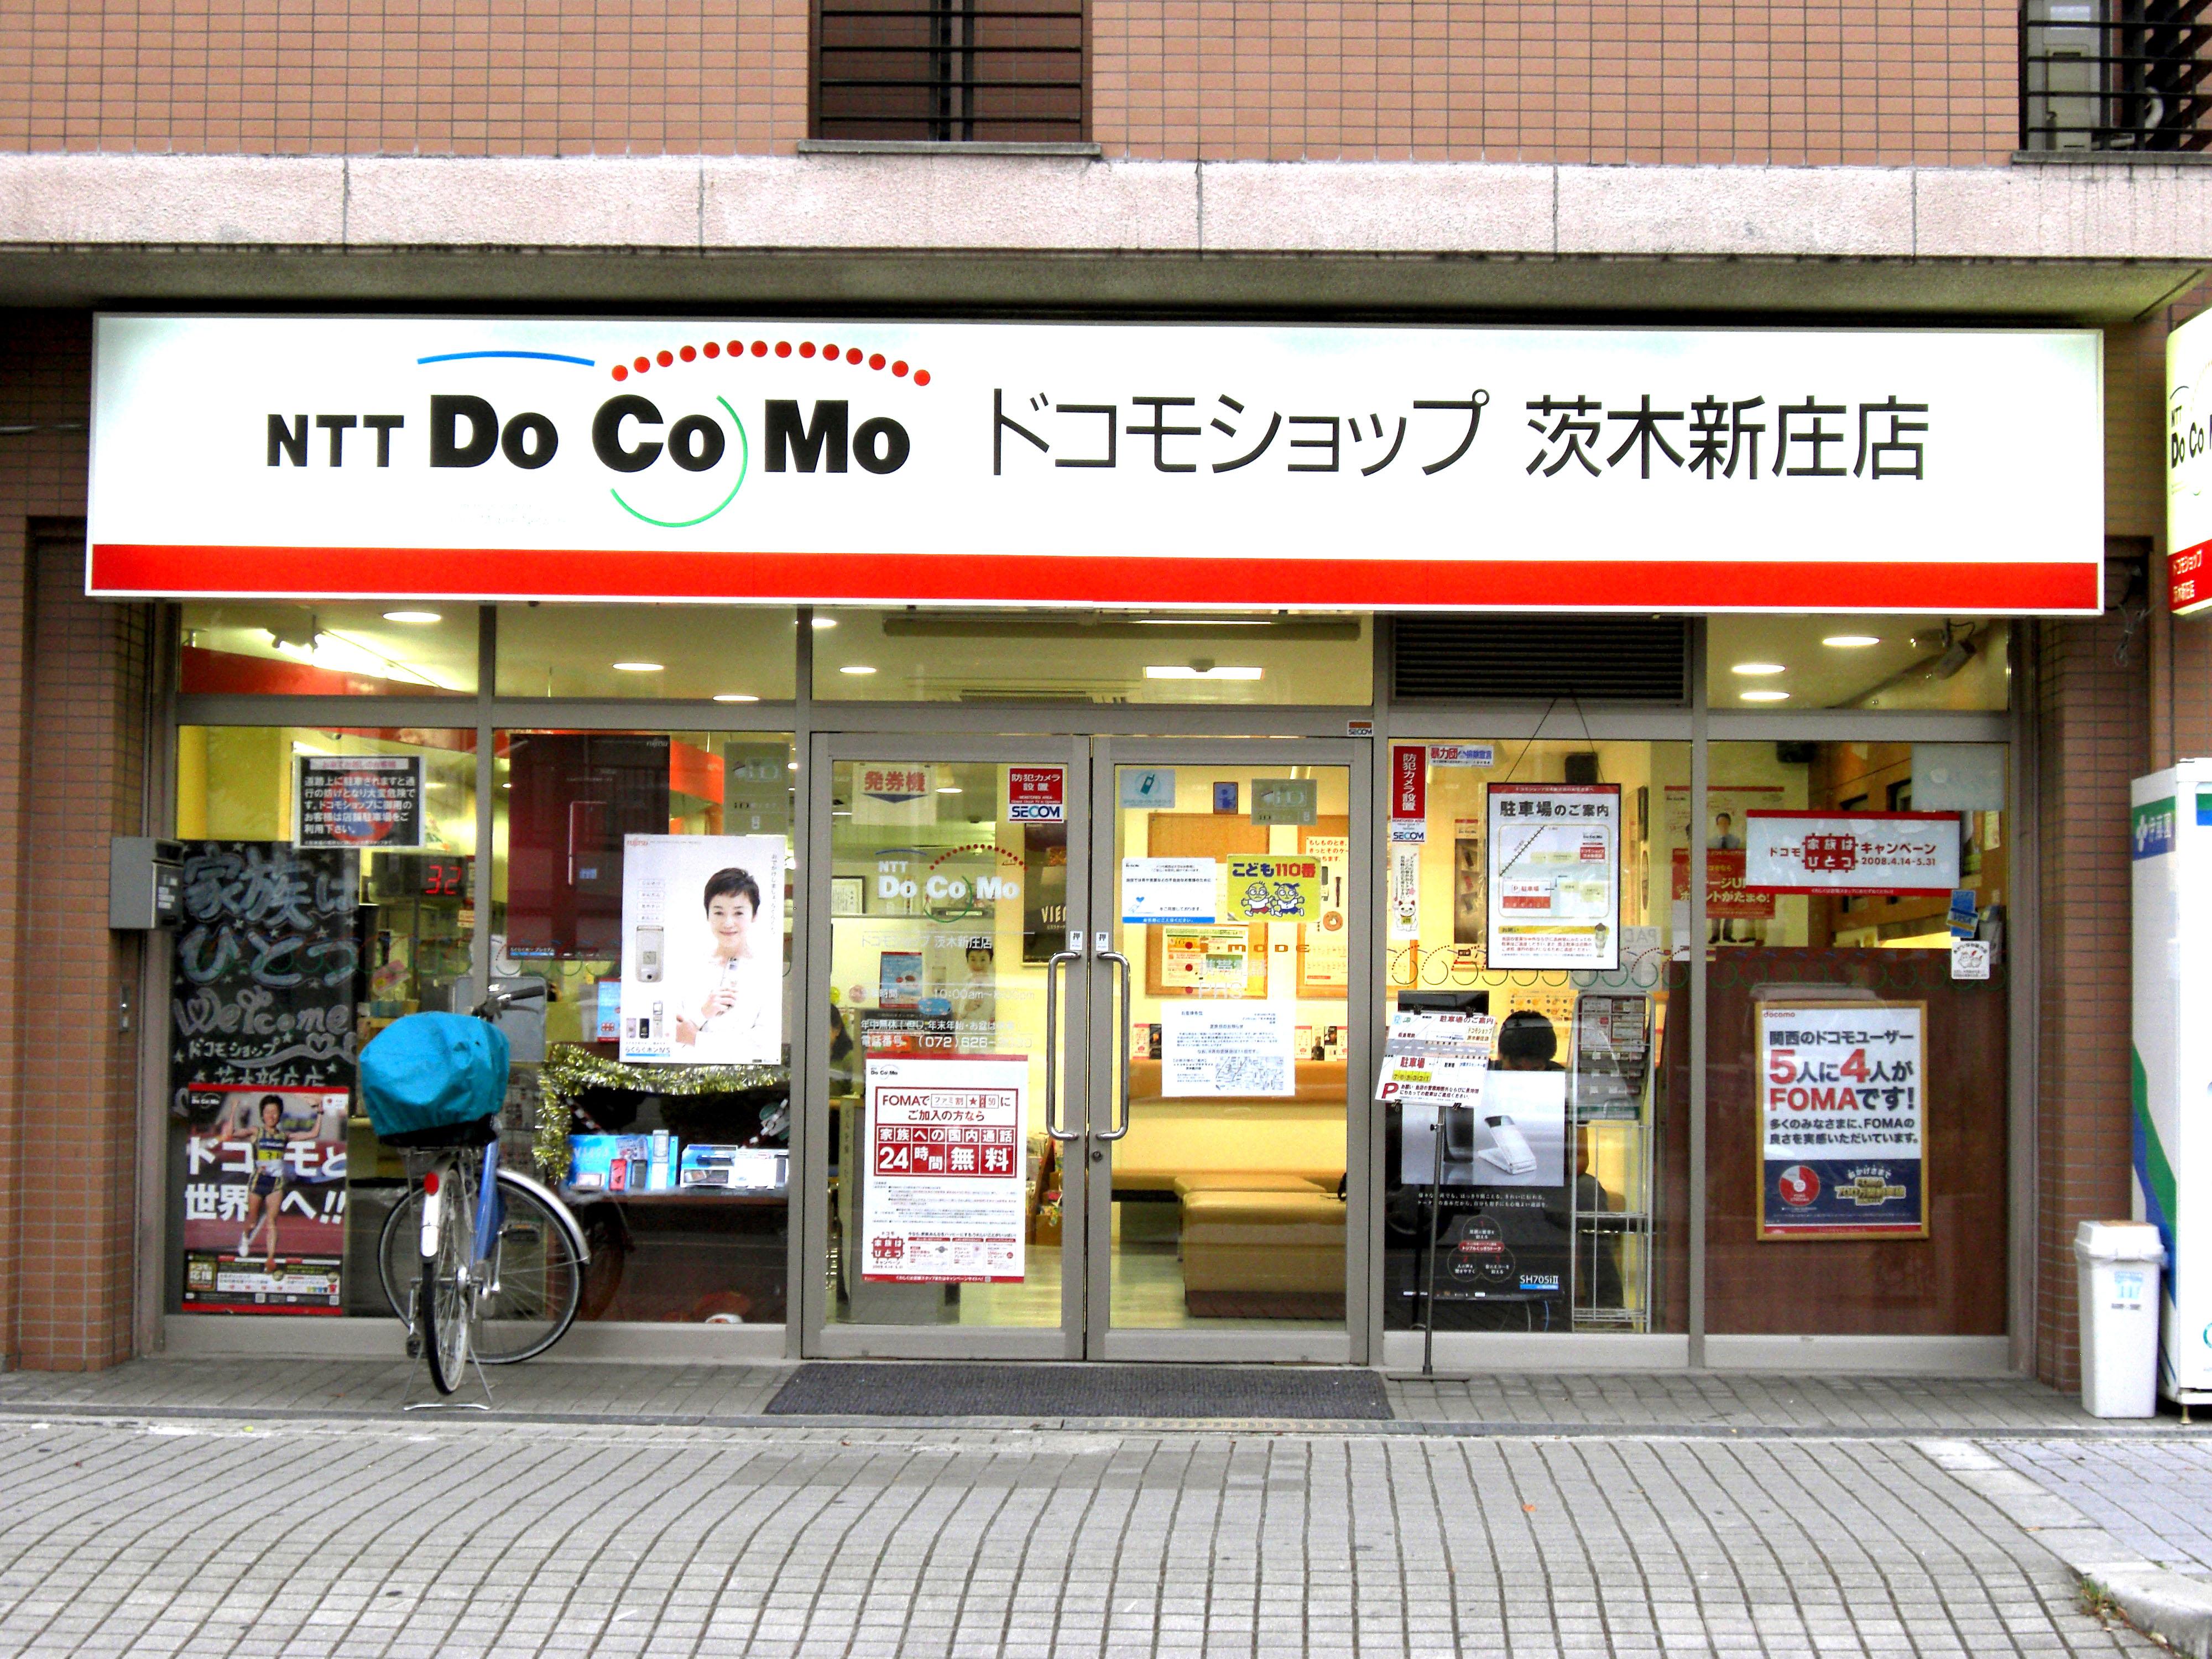 File:DoCoMo Shop Ibaraki-Shinjo.JPG - Wikimedia Commons